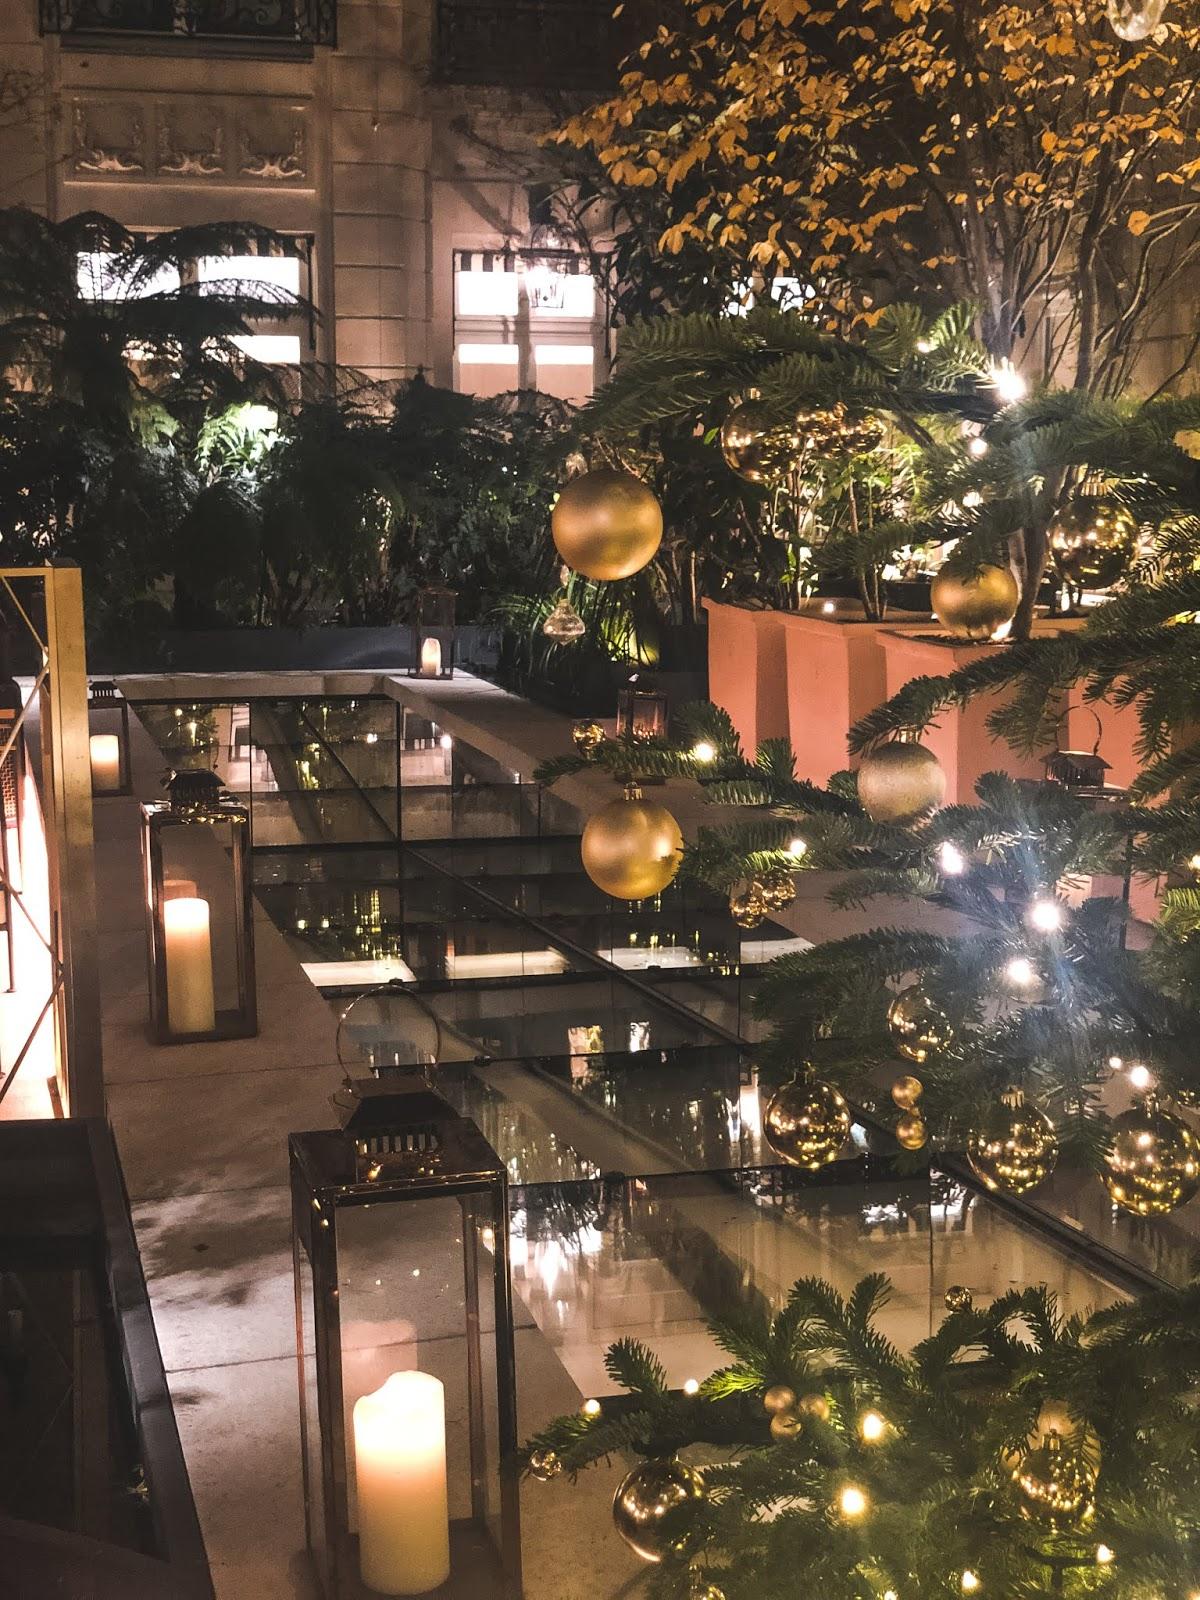 hôtel de Crillon jardin d'hiver